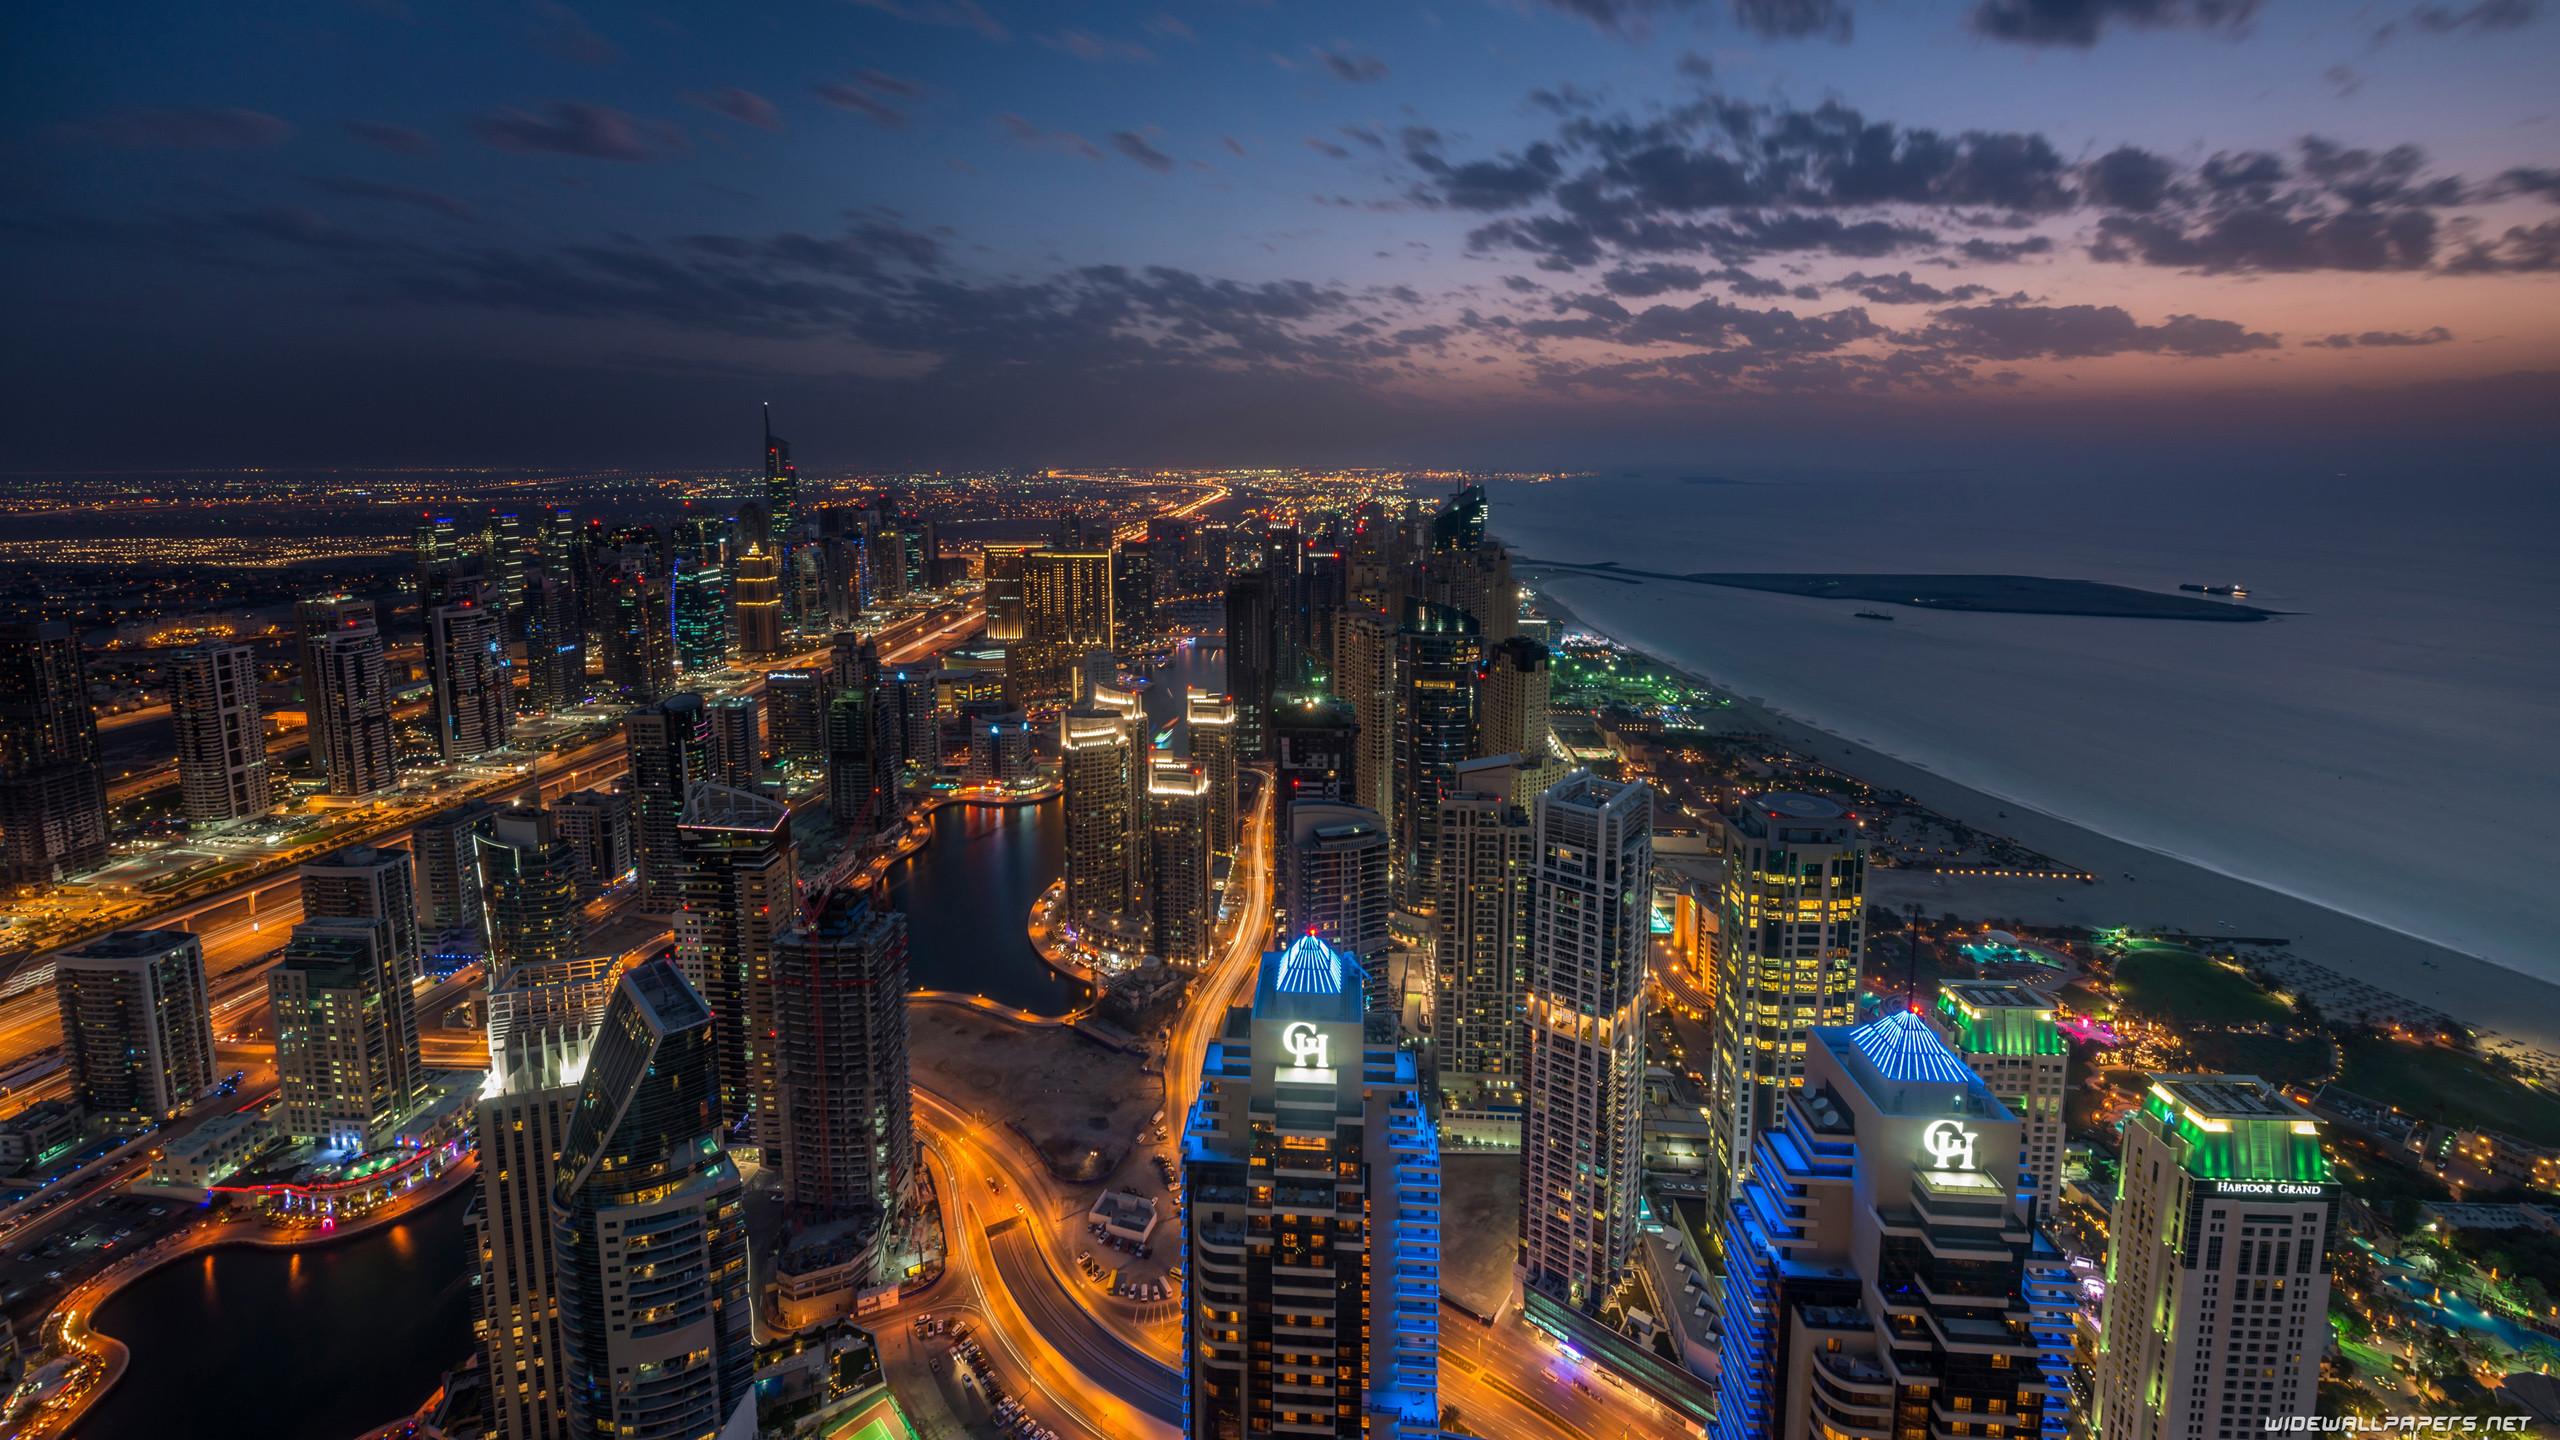 Dubai wallpapers 4K Ultra HD Dubai 2560×1600 3840×2160